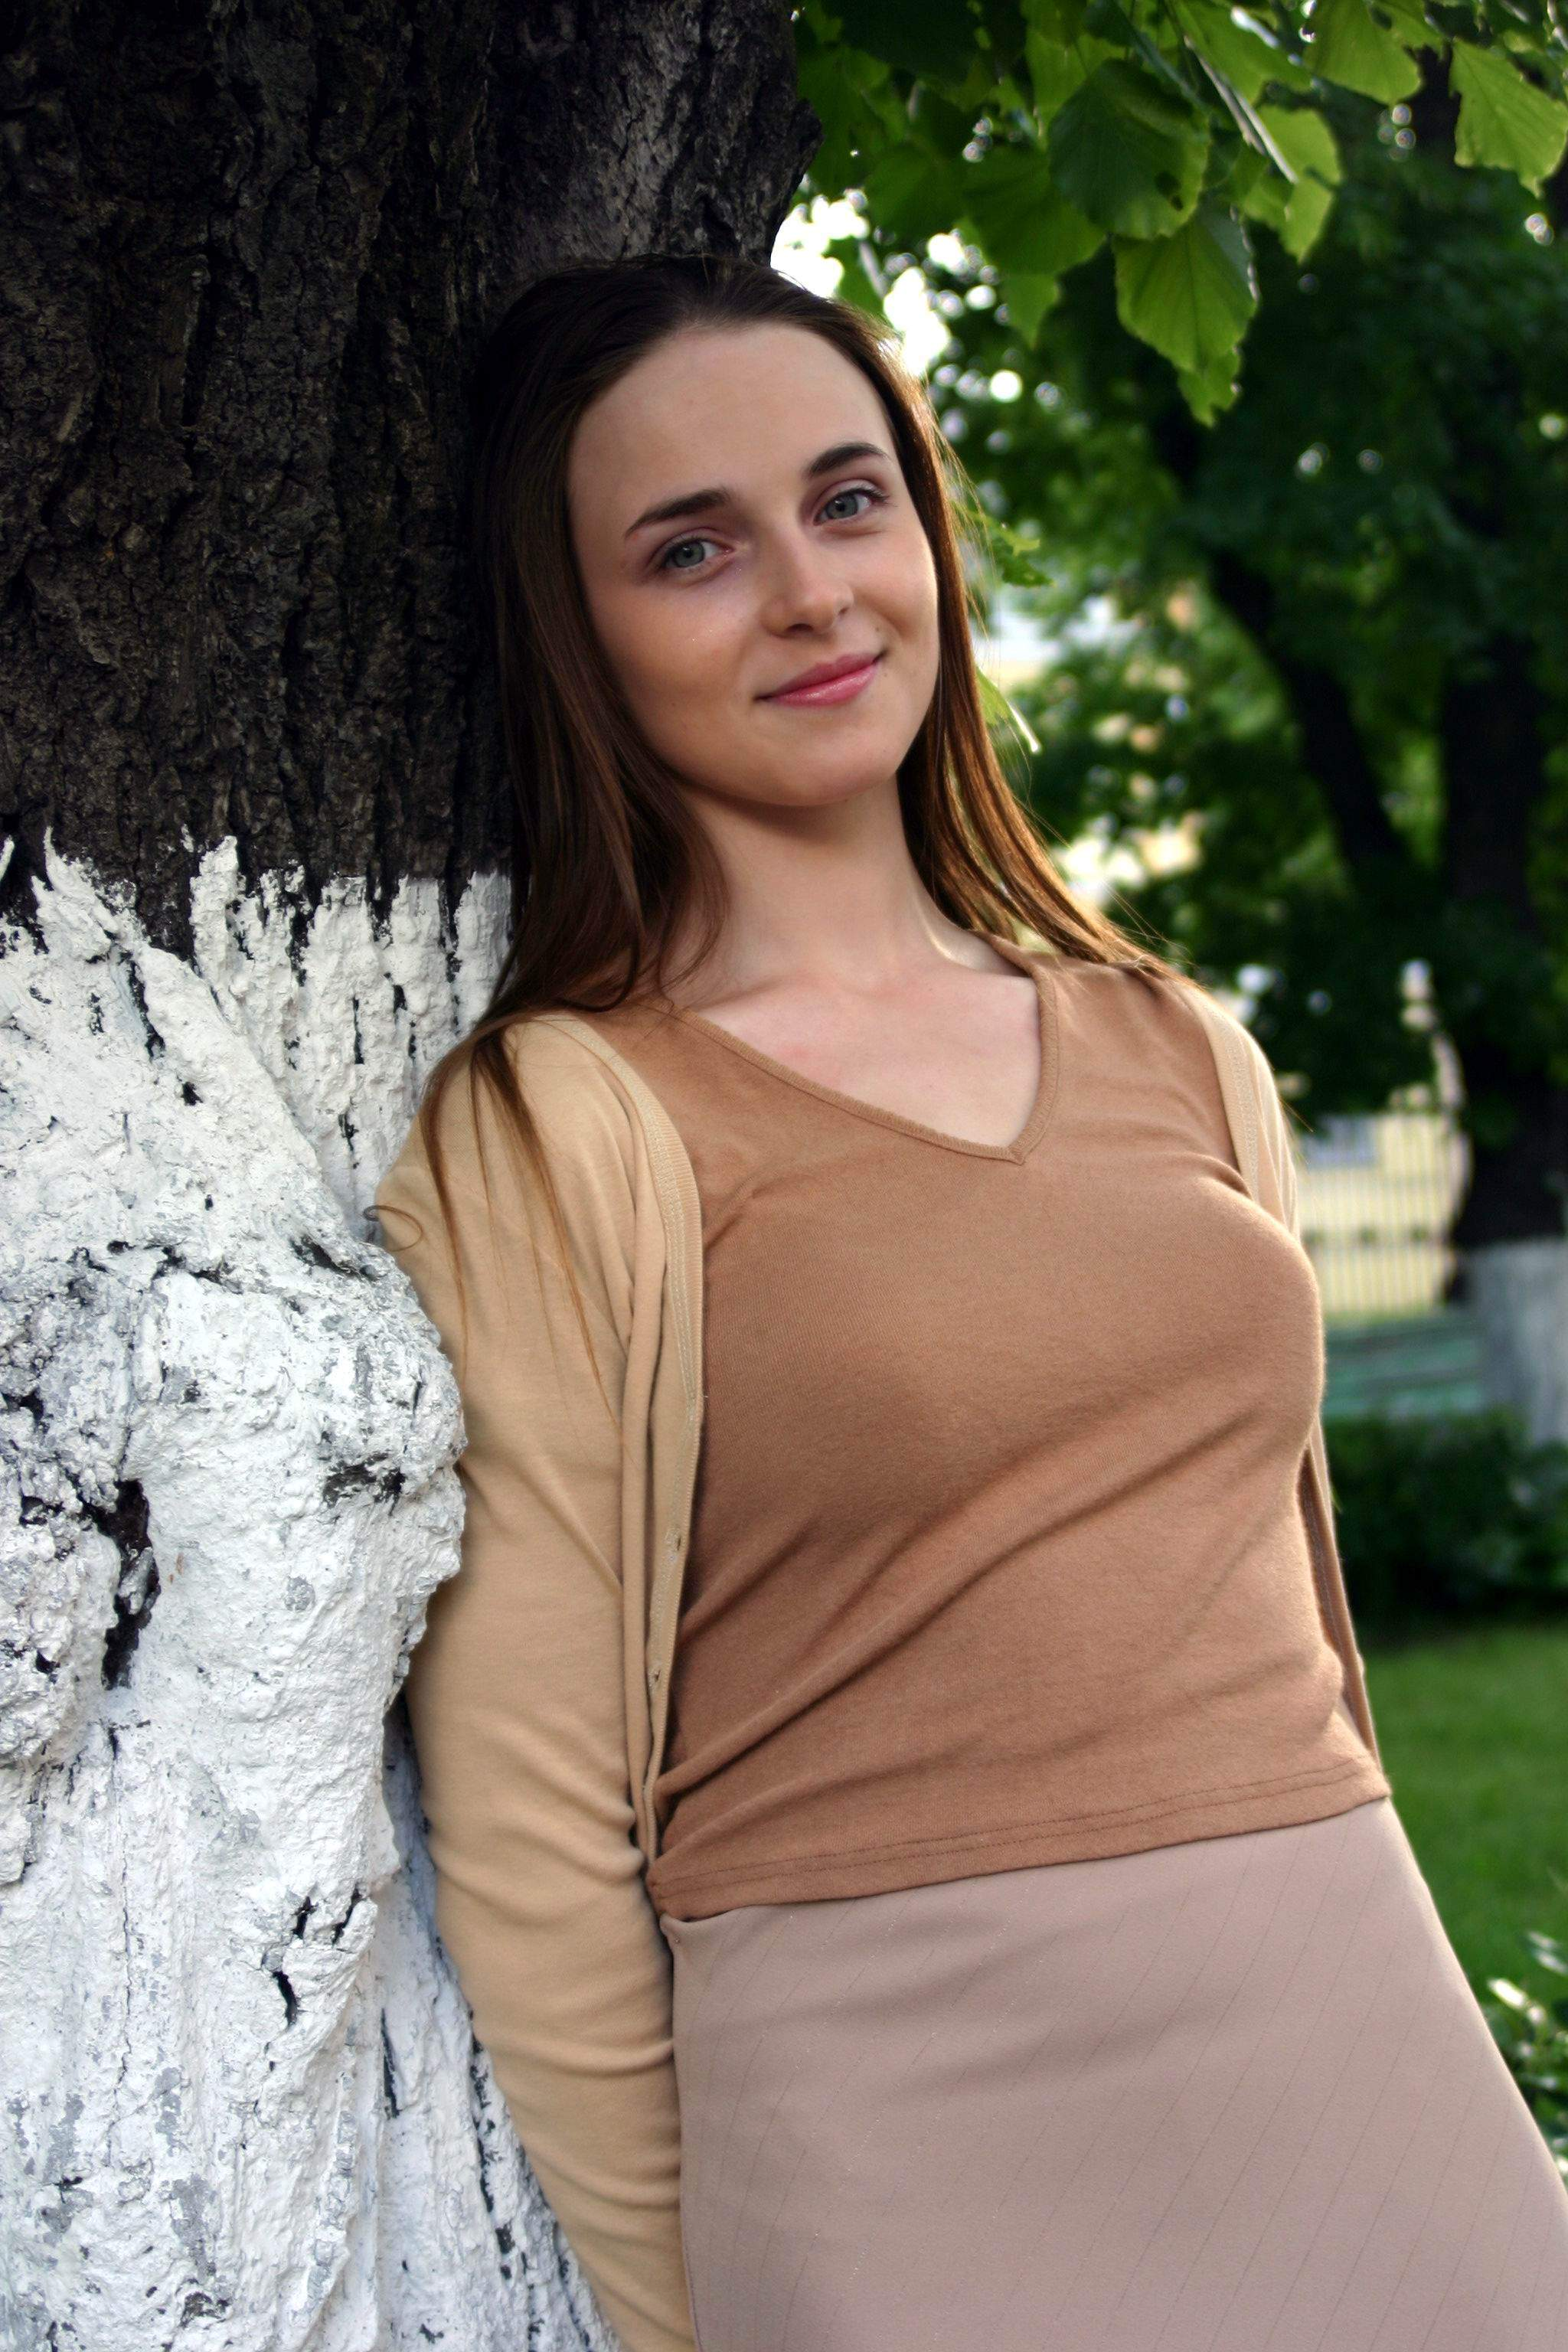 Фото русская актриса анна 9 фотография